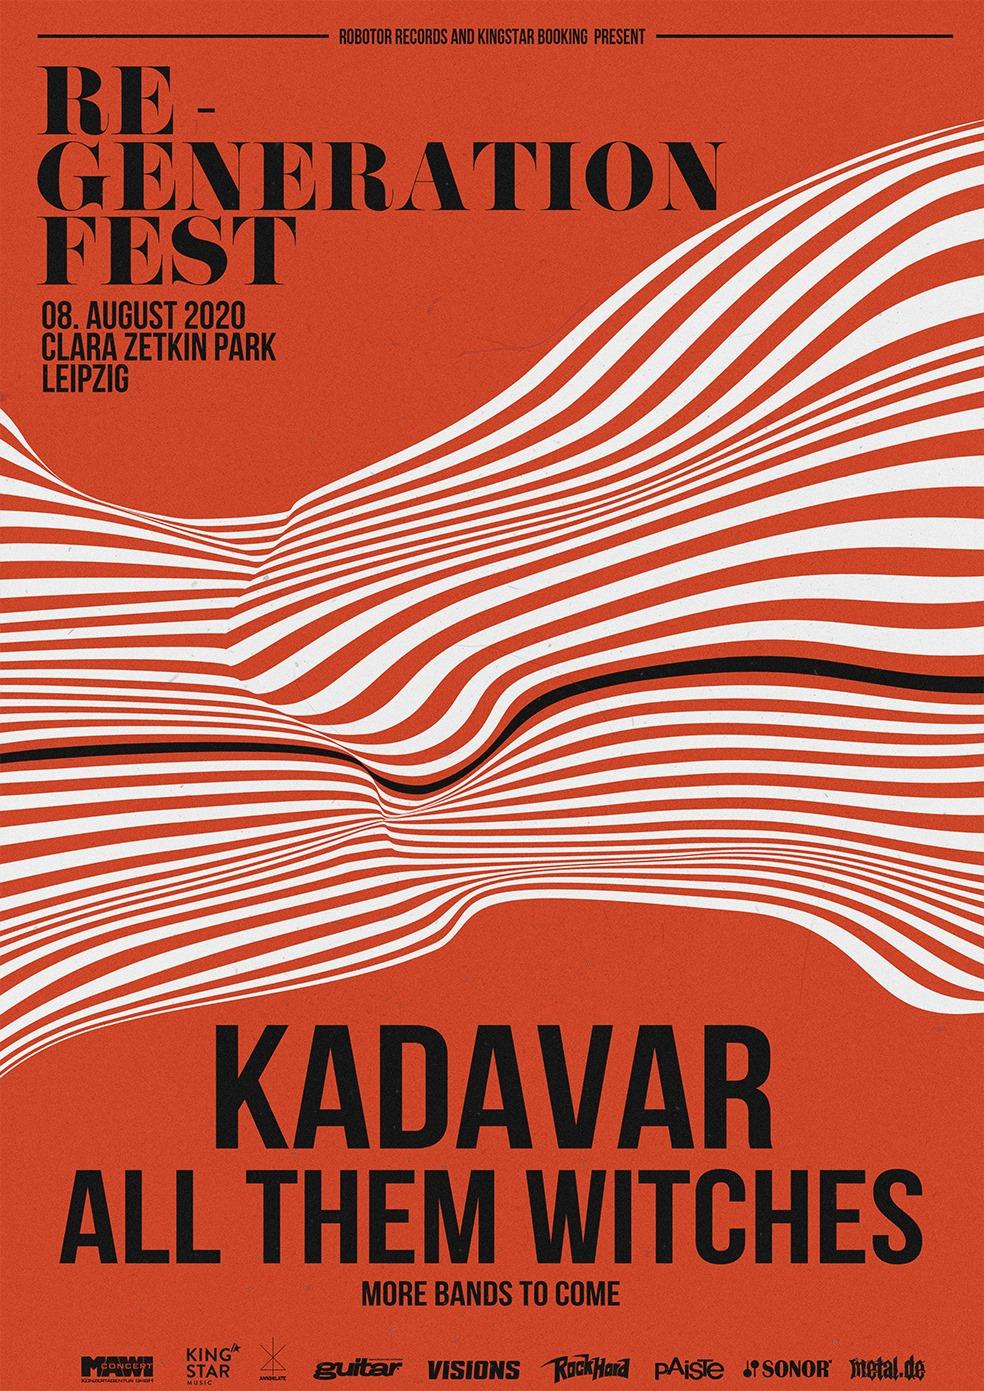 re-generation fest 2020 poster